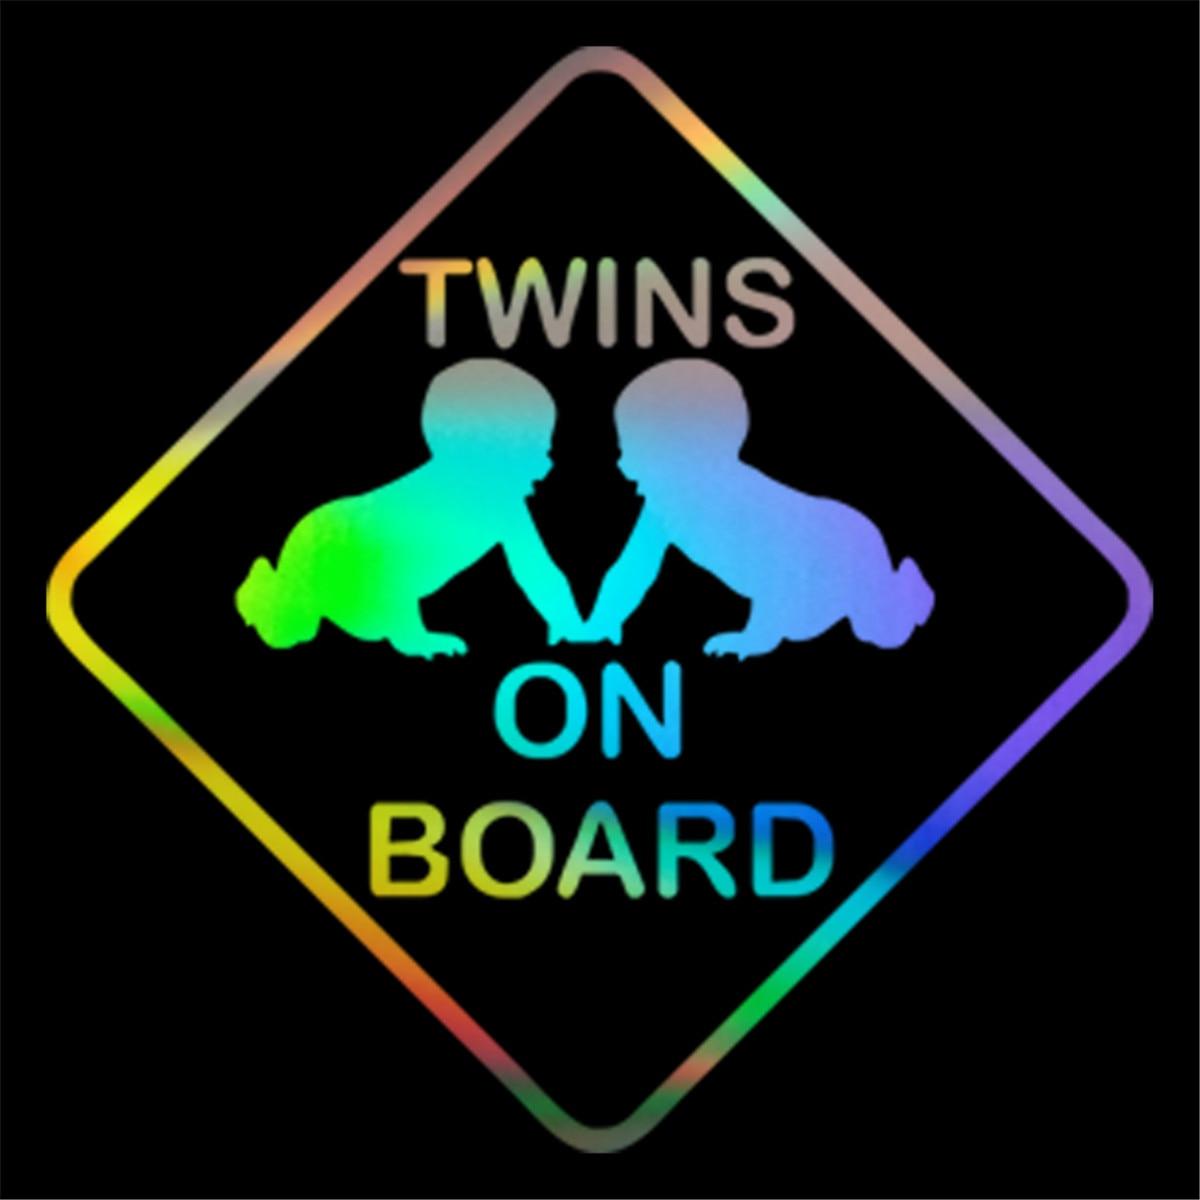 Twins On Board Decal Window Bumper Baby On Board Car Decal Laptop Cute Twins